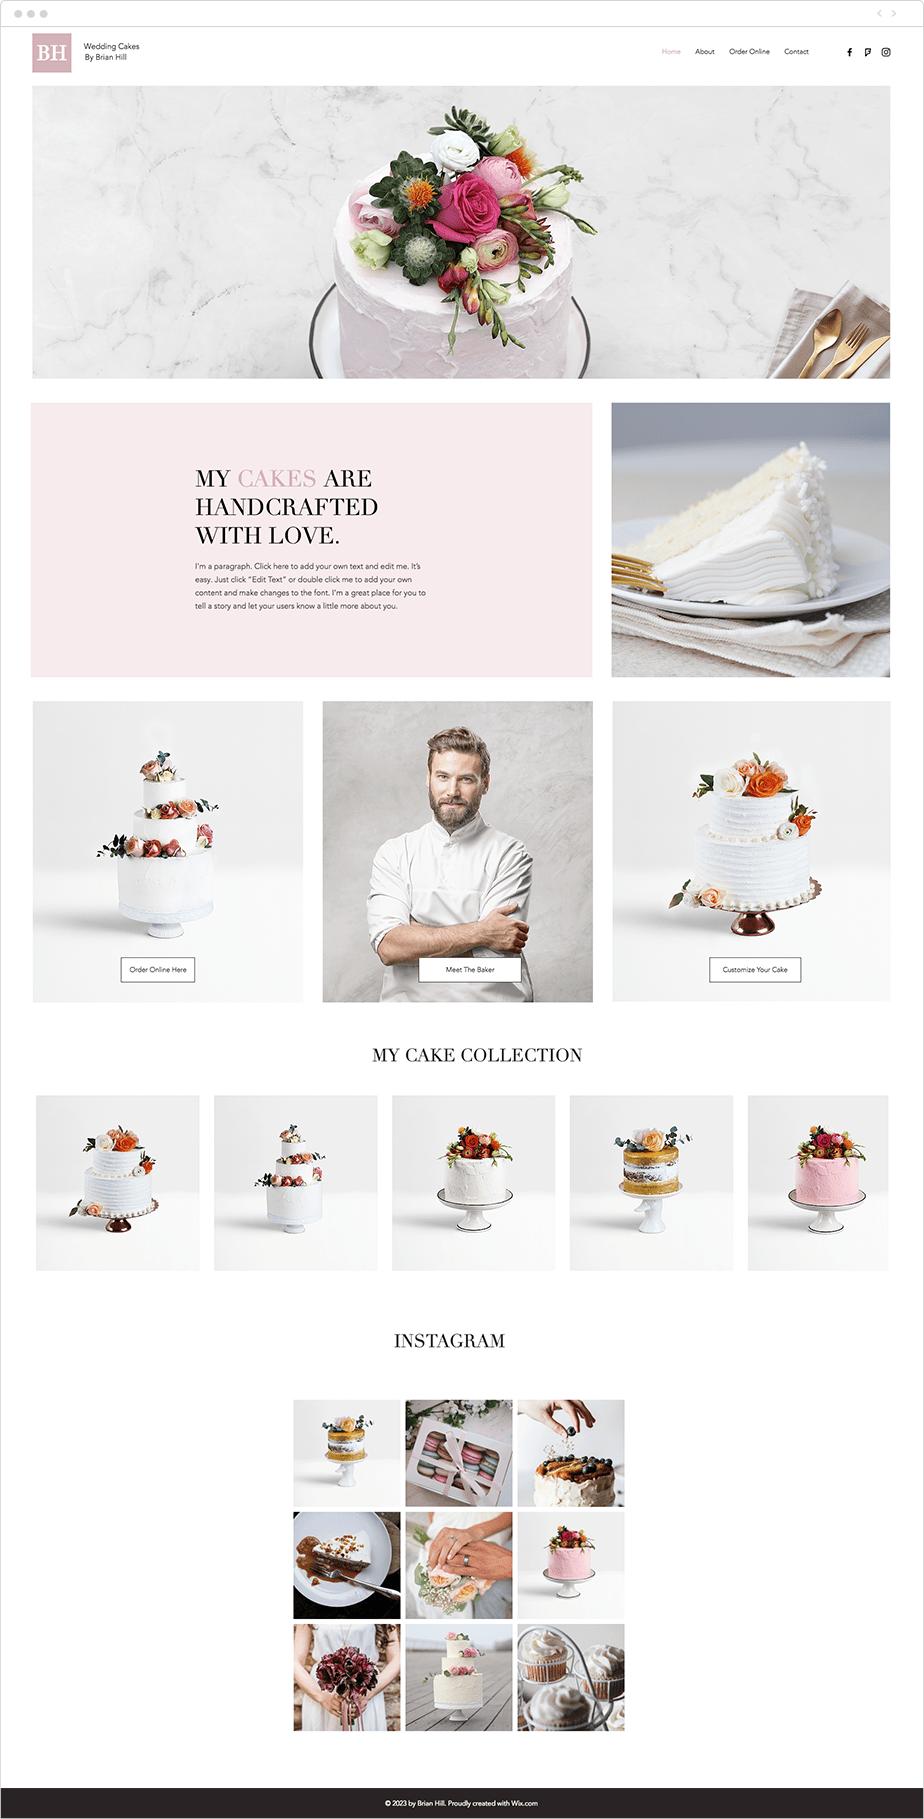 Wedding cakes website template